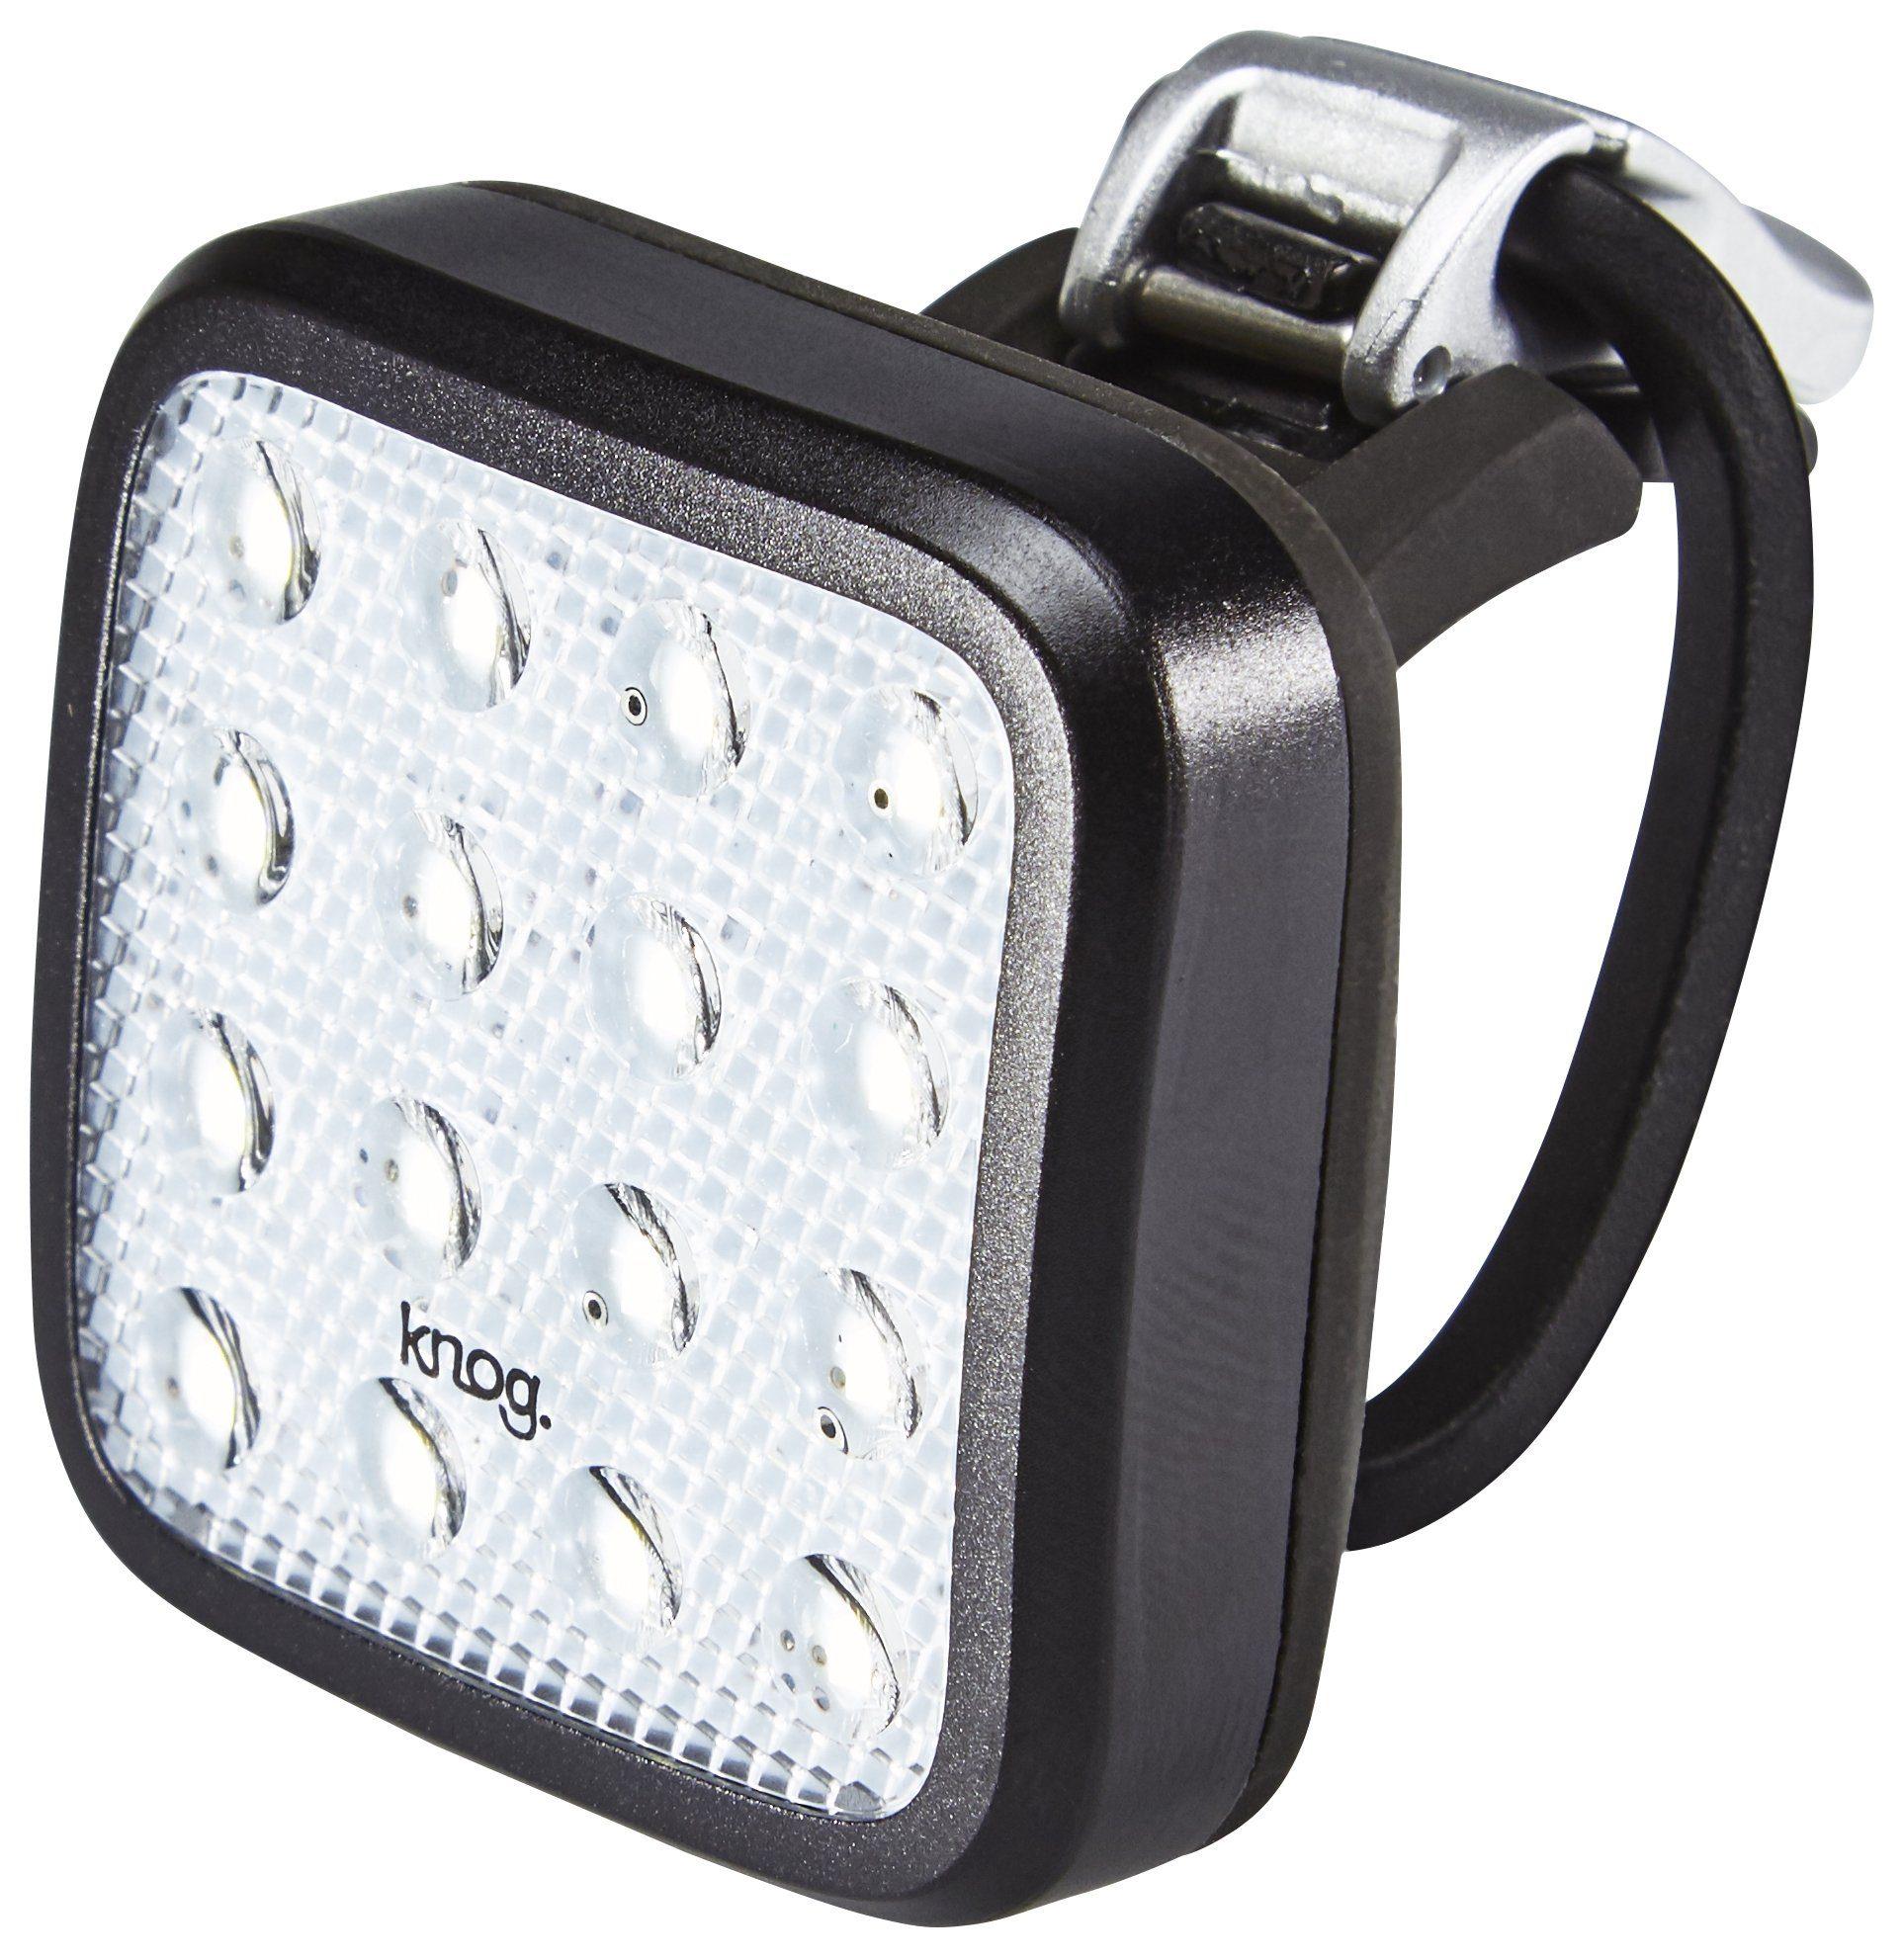 Knog Fahrradbeleuchtung »Blinder MOB Kid Grid Frontlicht weiße LED«